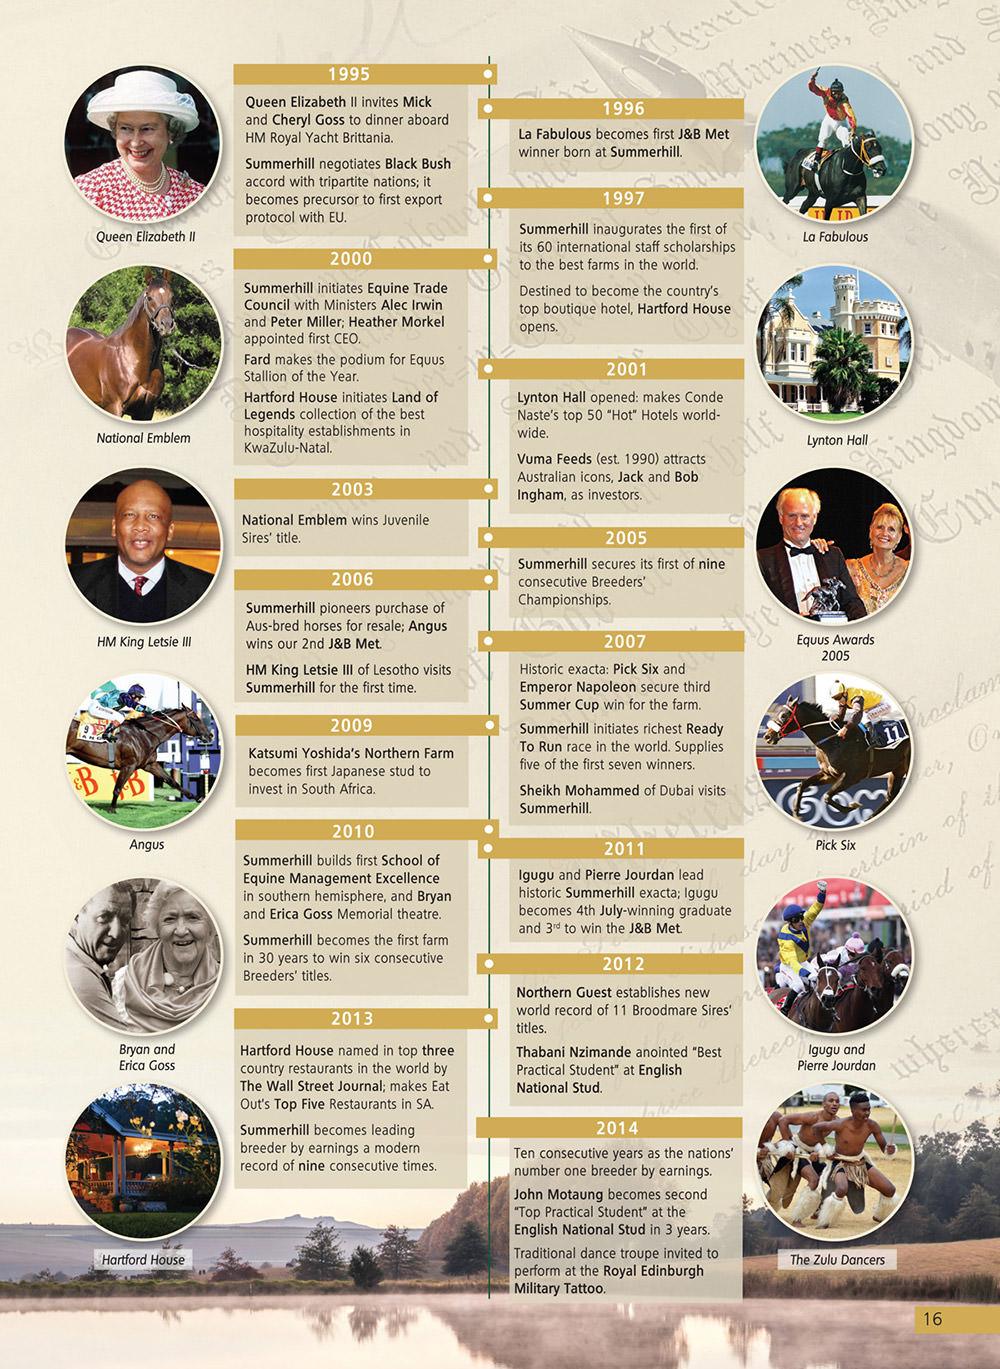 Summerhill Timeline 1995 - 2014